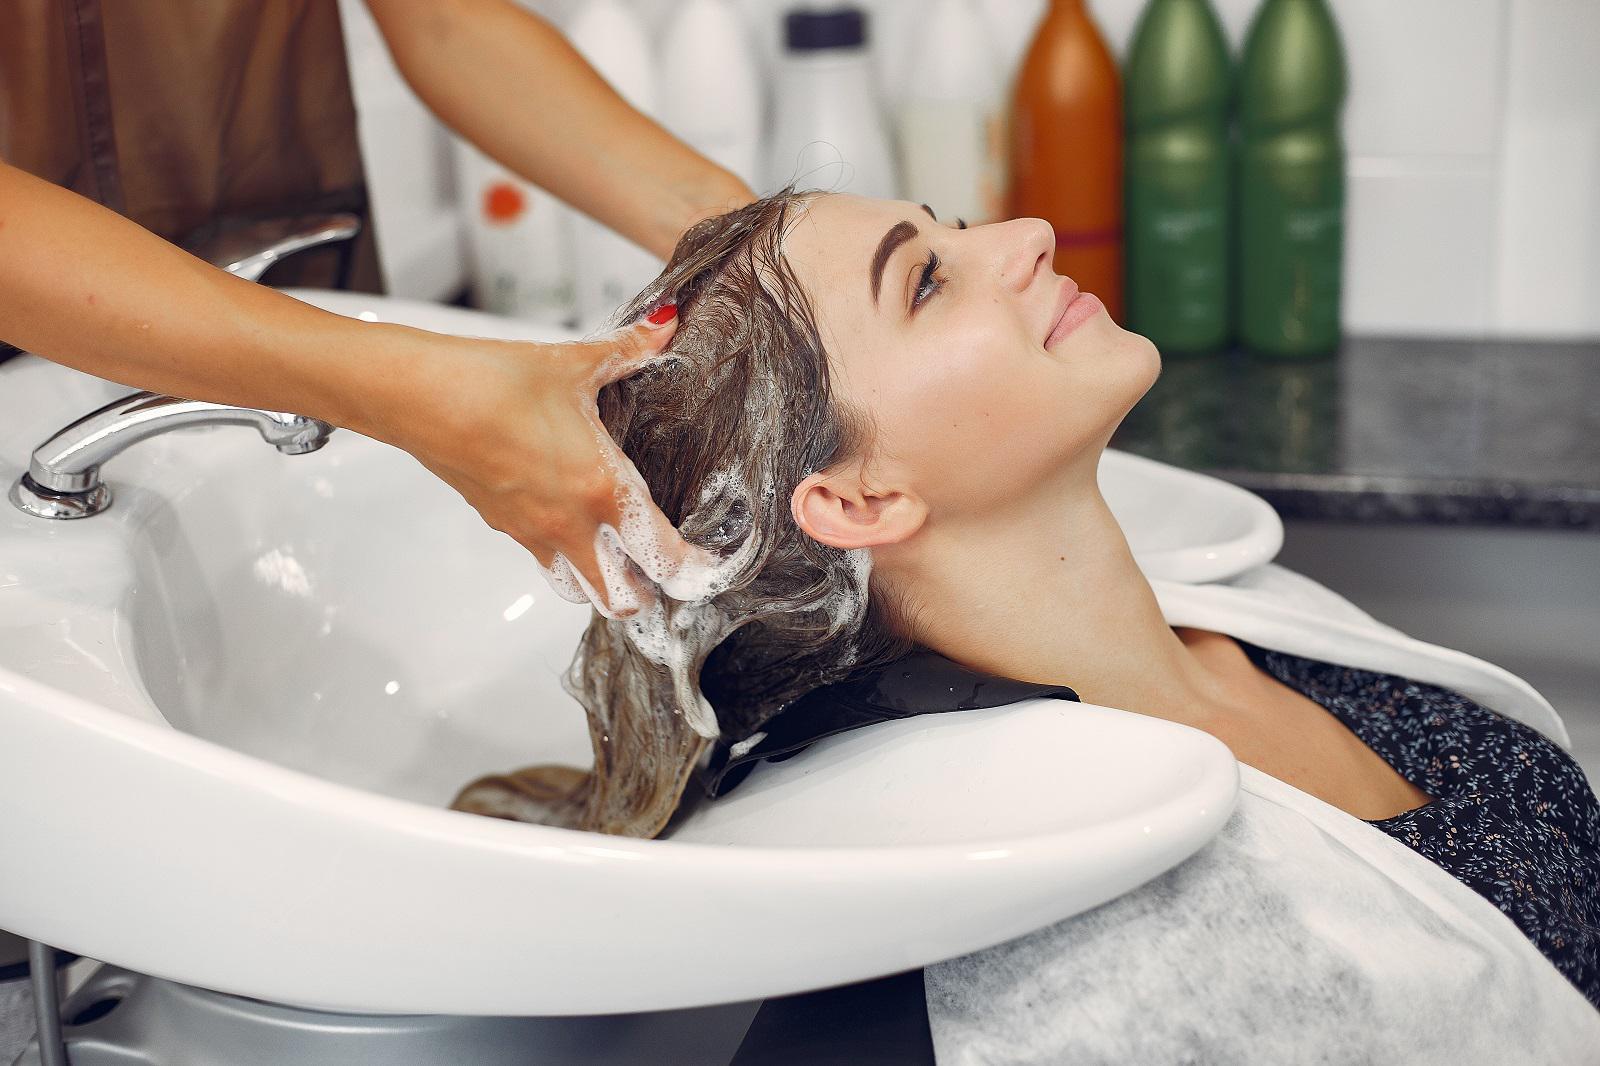 Hairdresser washing head her client. Woman in a hair salon